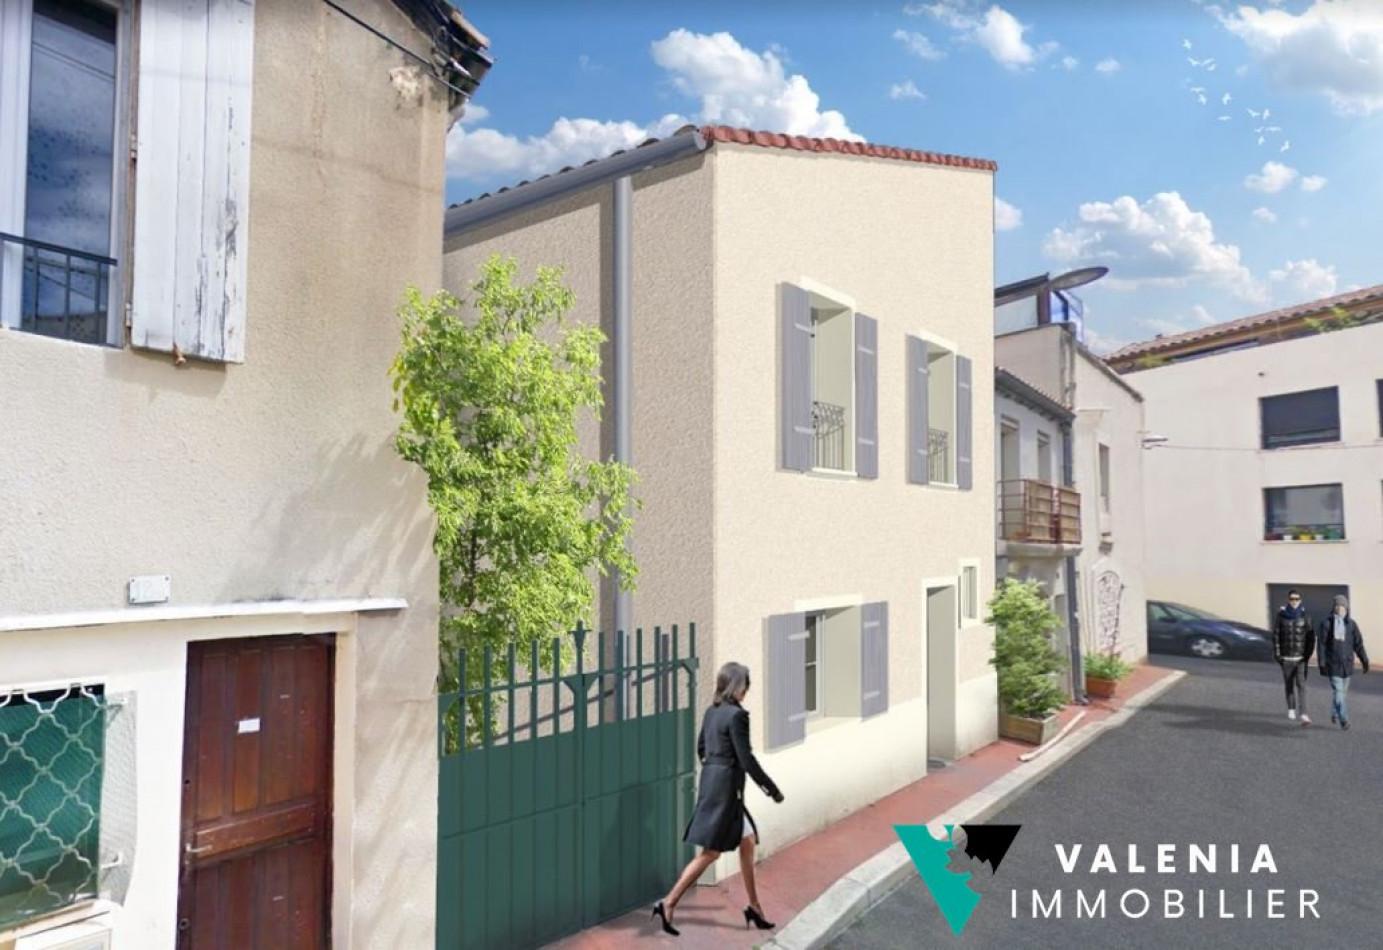 A vendre  Montpellier | Réf 3453411475 - Valenia immobilier